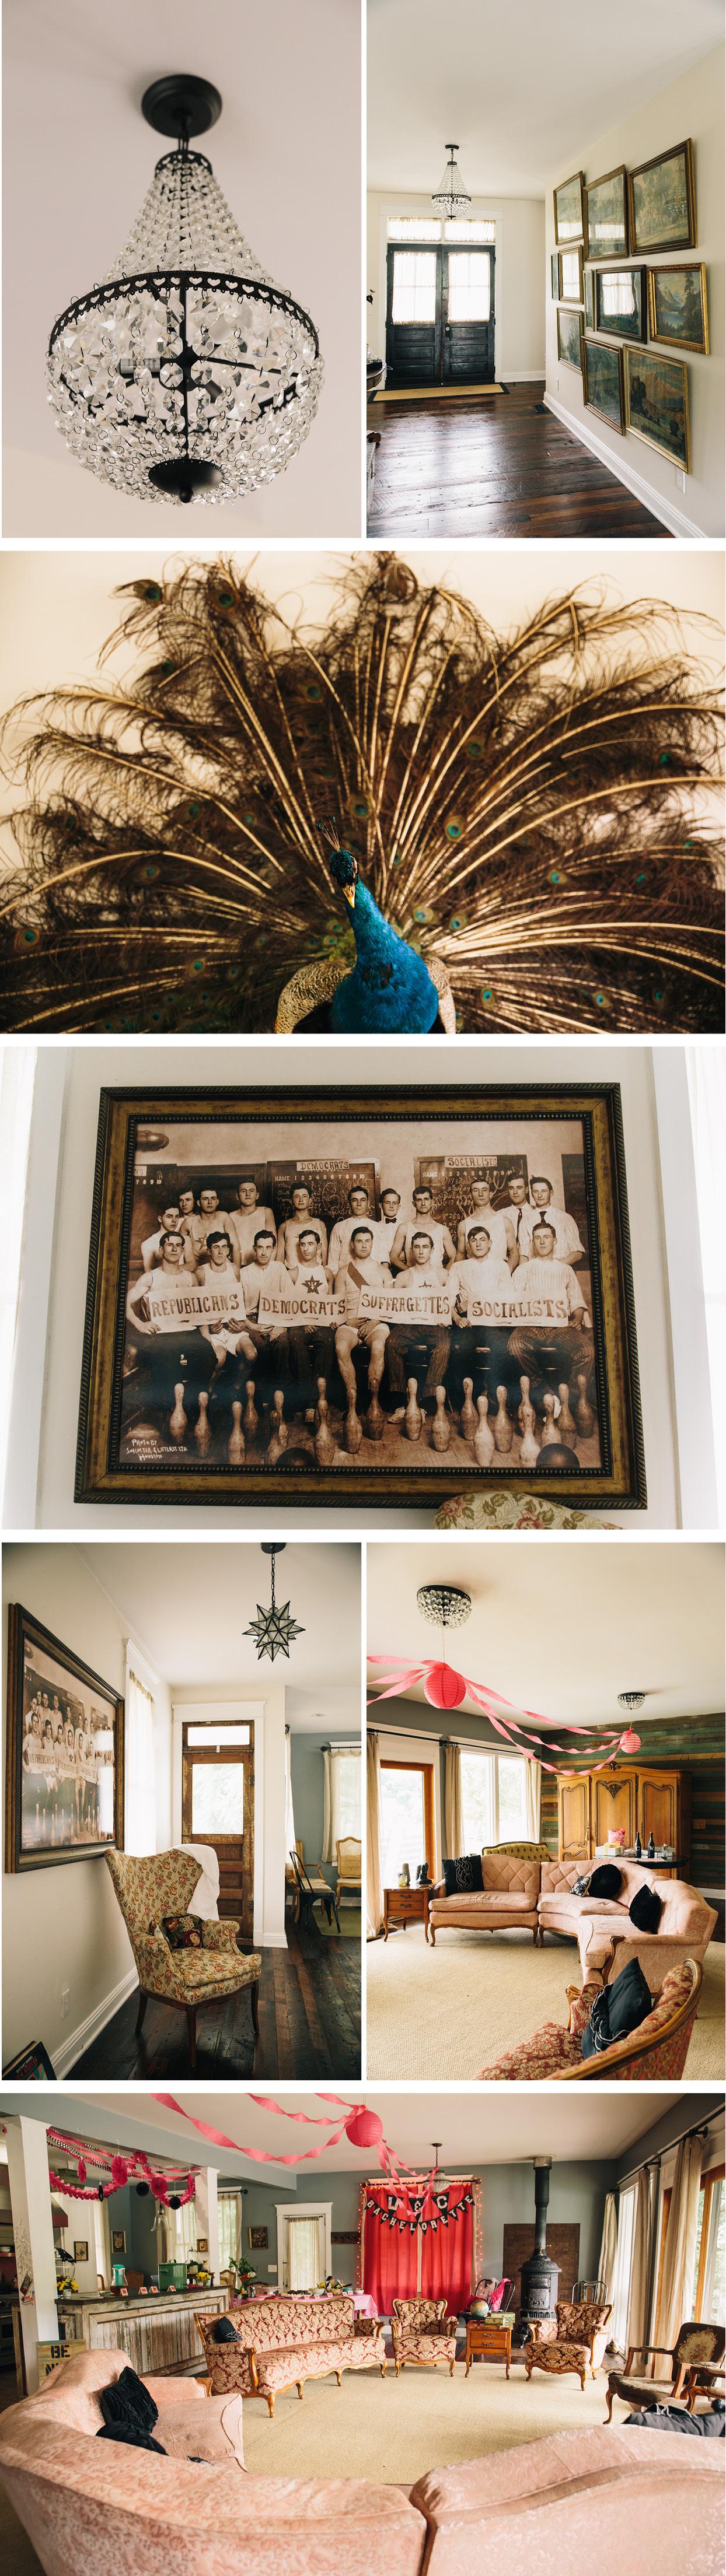 CK-Photo-Nashville-Wedding-Lifestyle-Photographer-cw2.jpg